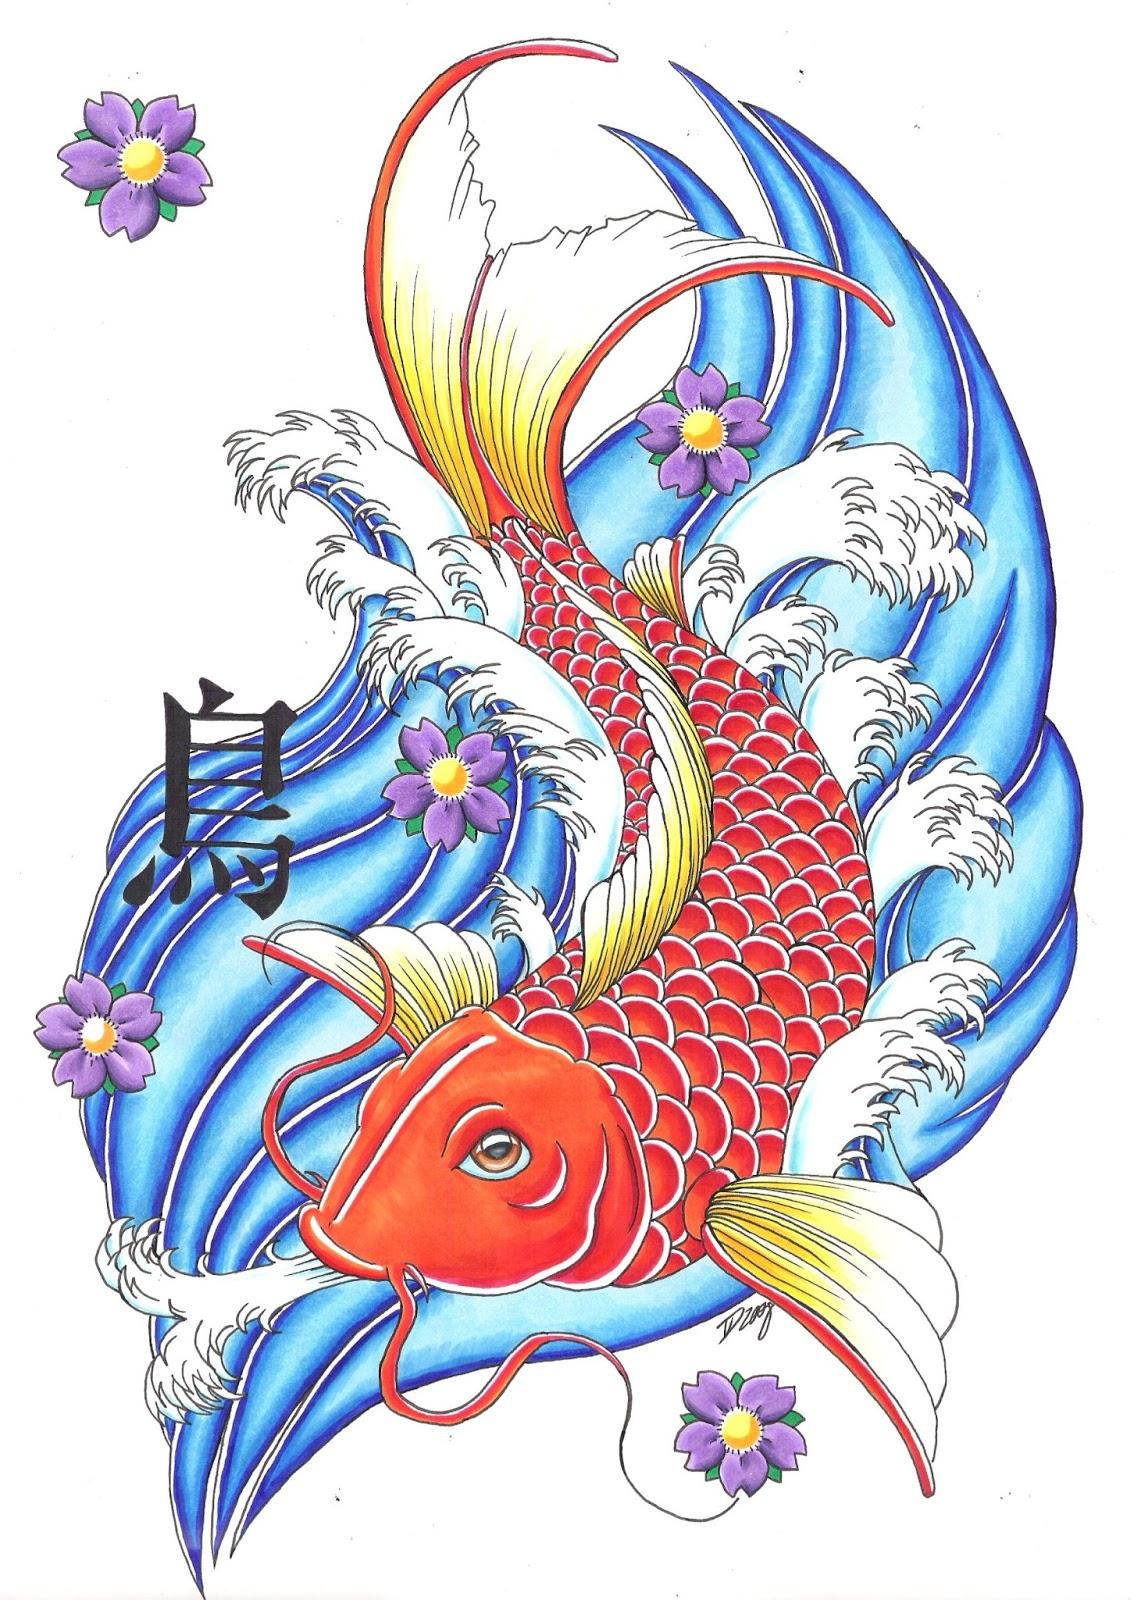 Koi Fish Tattoo Designs On Chest: Tatto: Koi Fish Tattoo